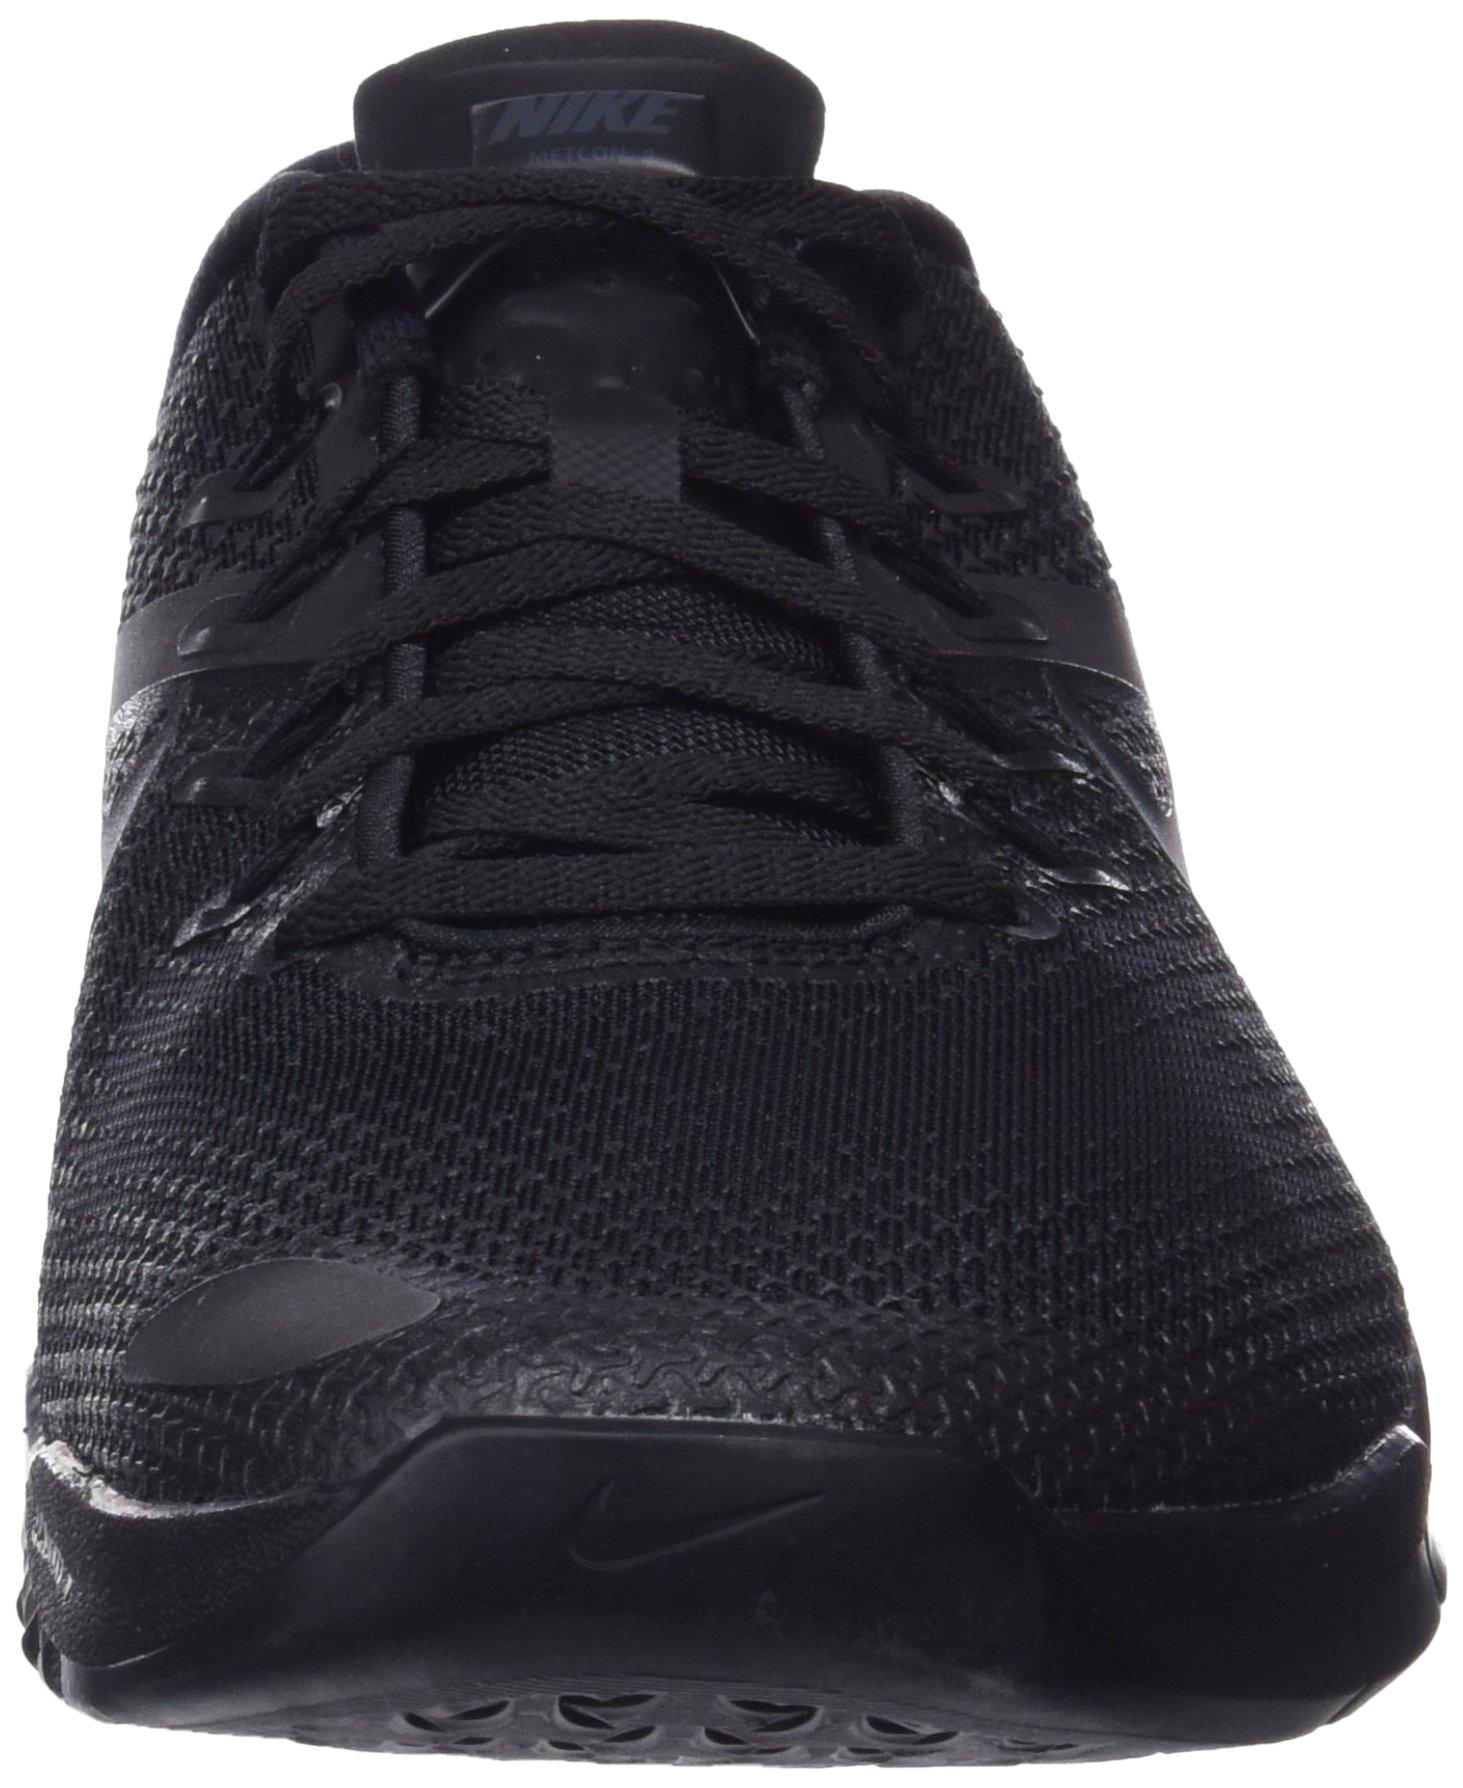 Nike Men's Metcon 4 Training Shoe Black/Black-Black-Hyper Crimson 7.5 by Nike (Image #4)